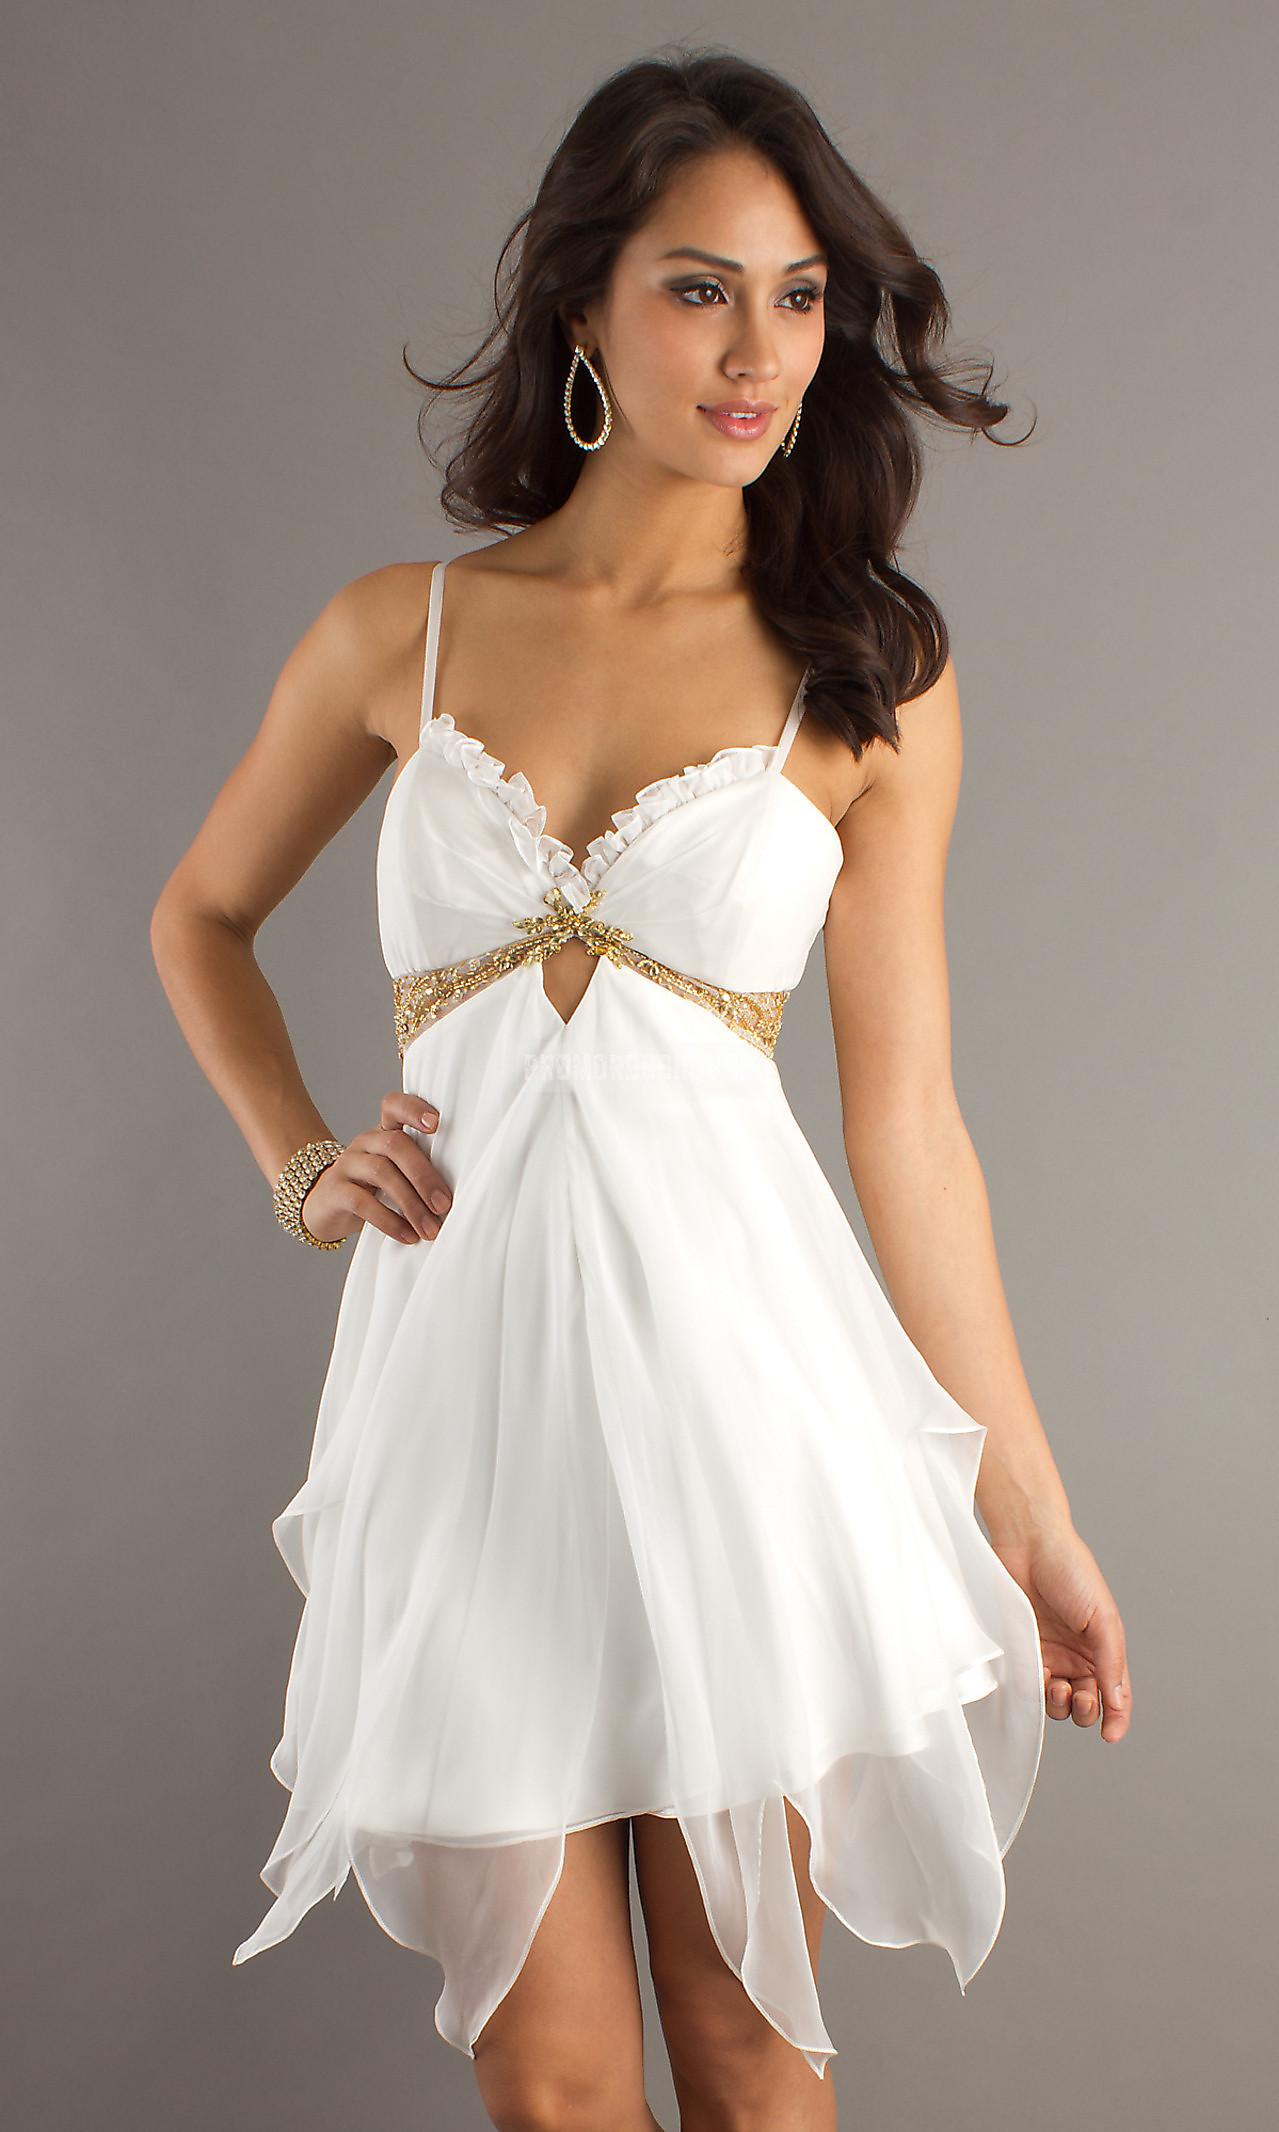 Elegant Keyhole Spaghetti Straps White Ruffles Chiffon Cocktail Dress - Promdresshouse.com